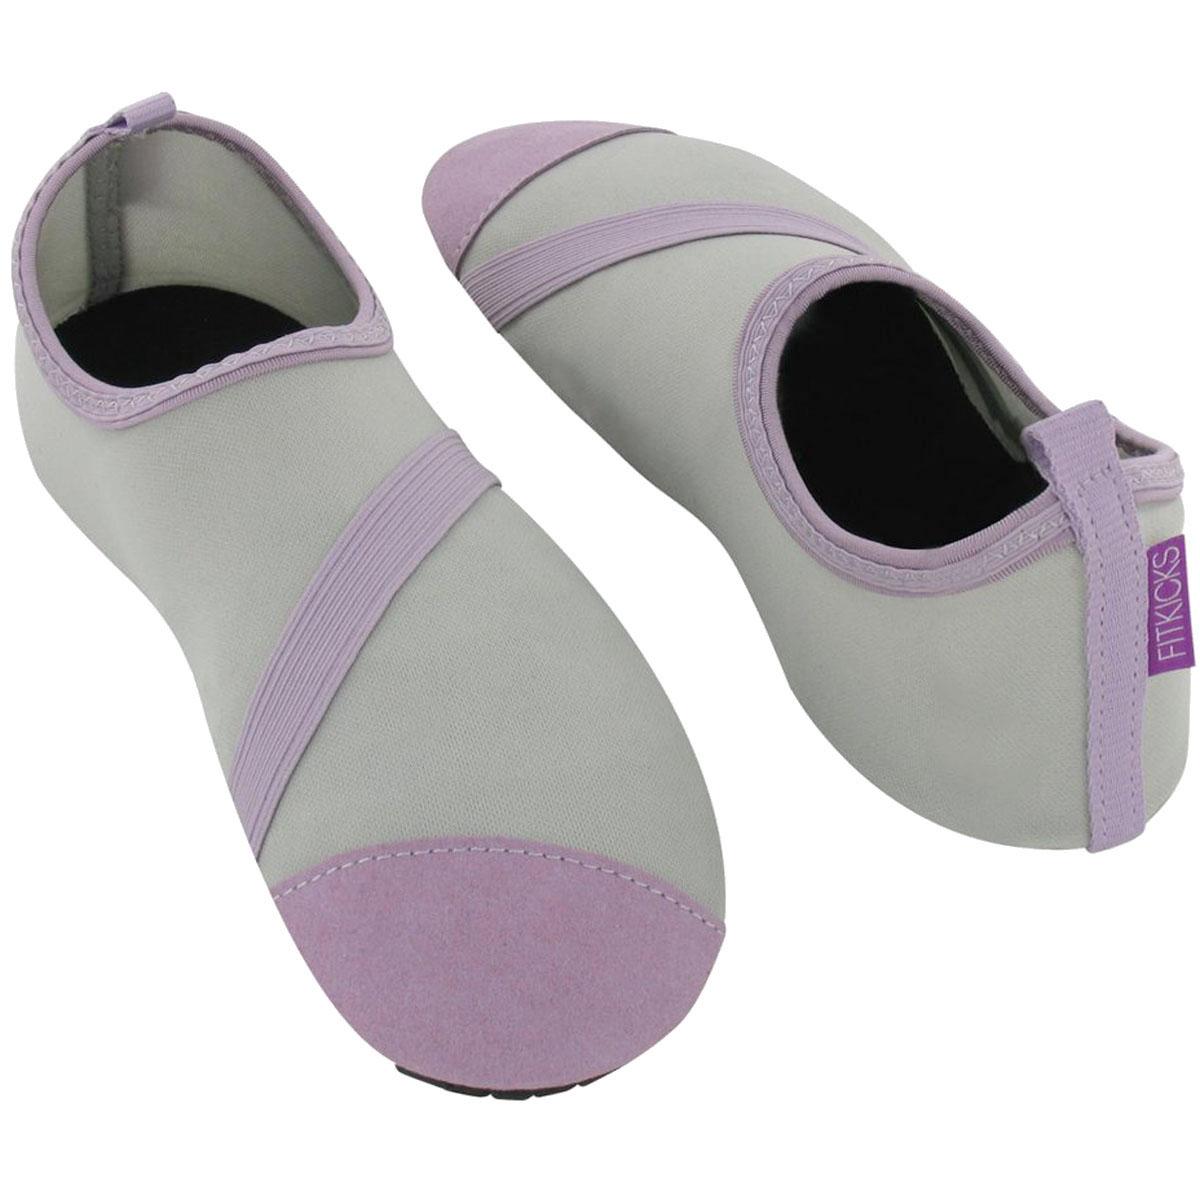 FitKicks-Women-039-s-Non-Slip-Sole-Active-Footwear thumbnail 24